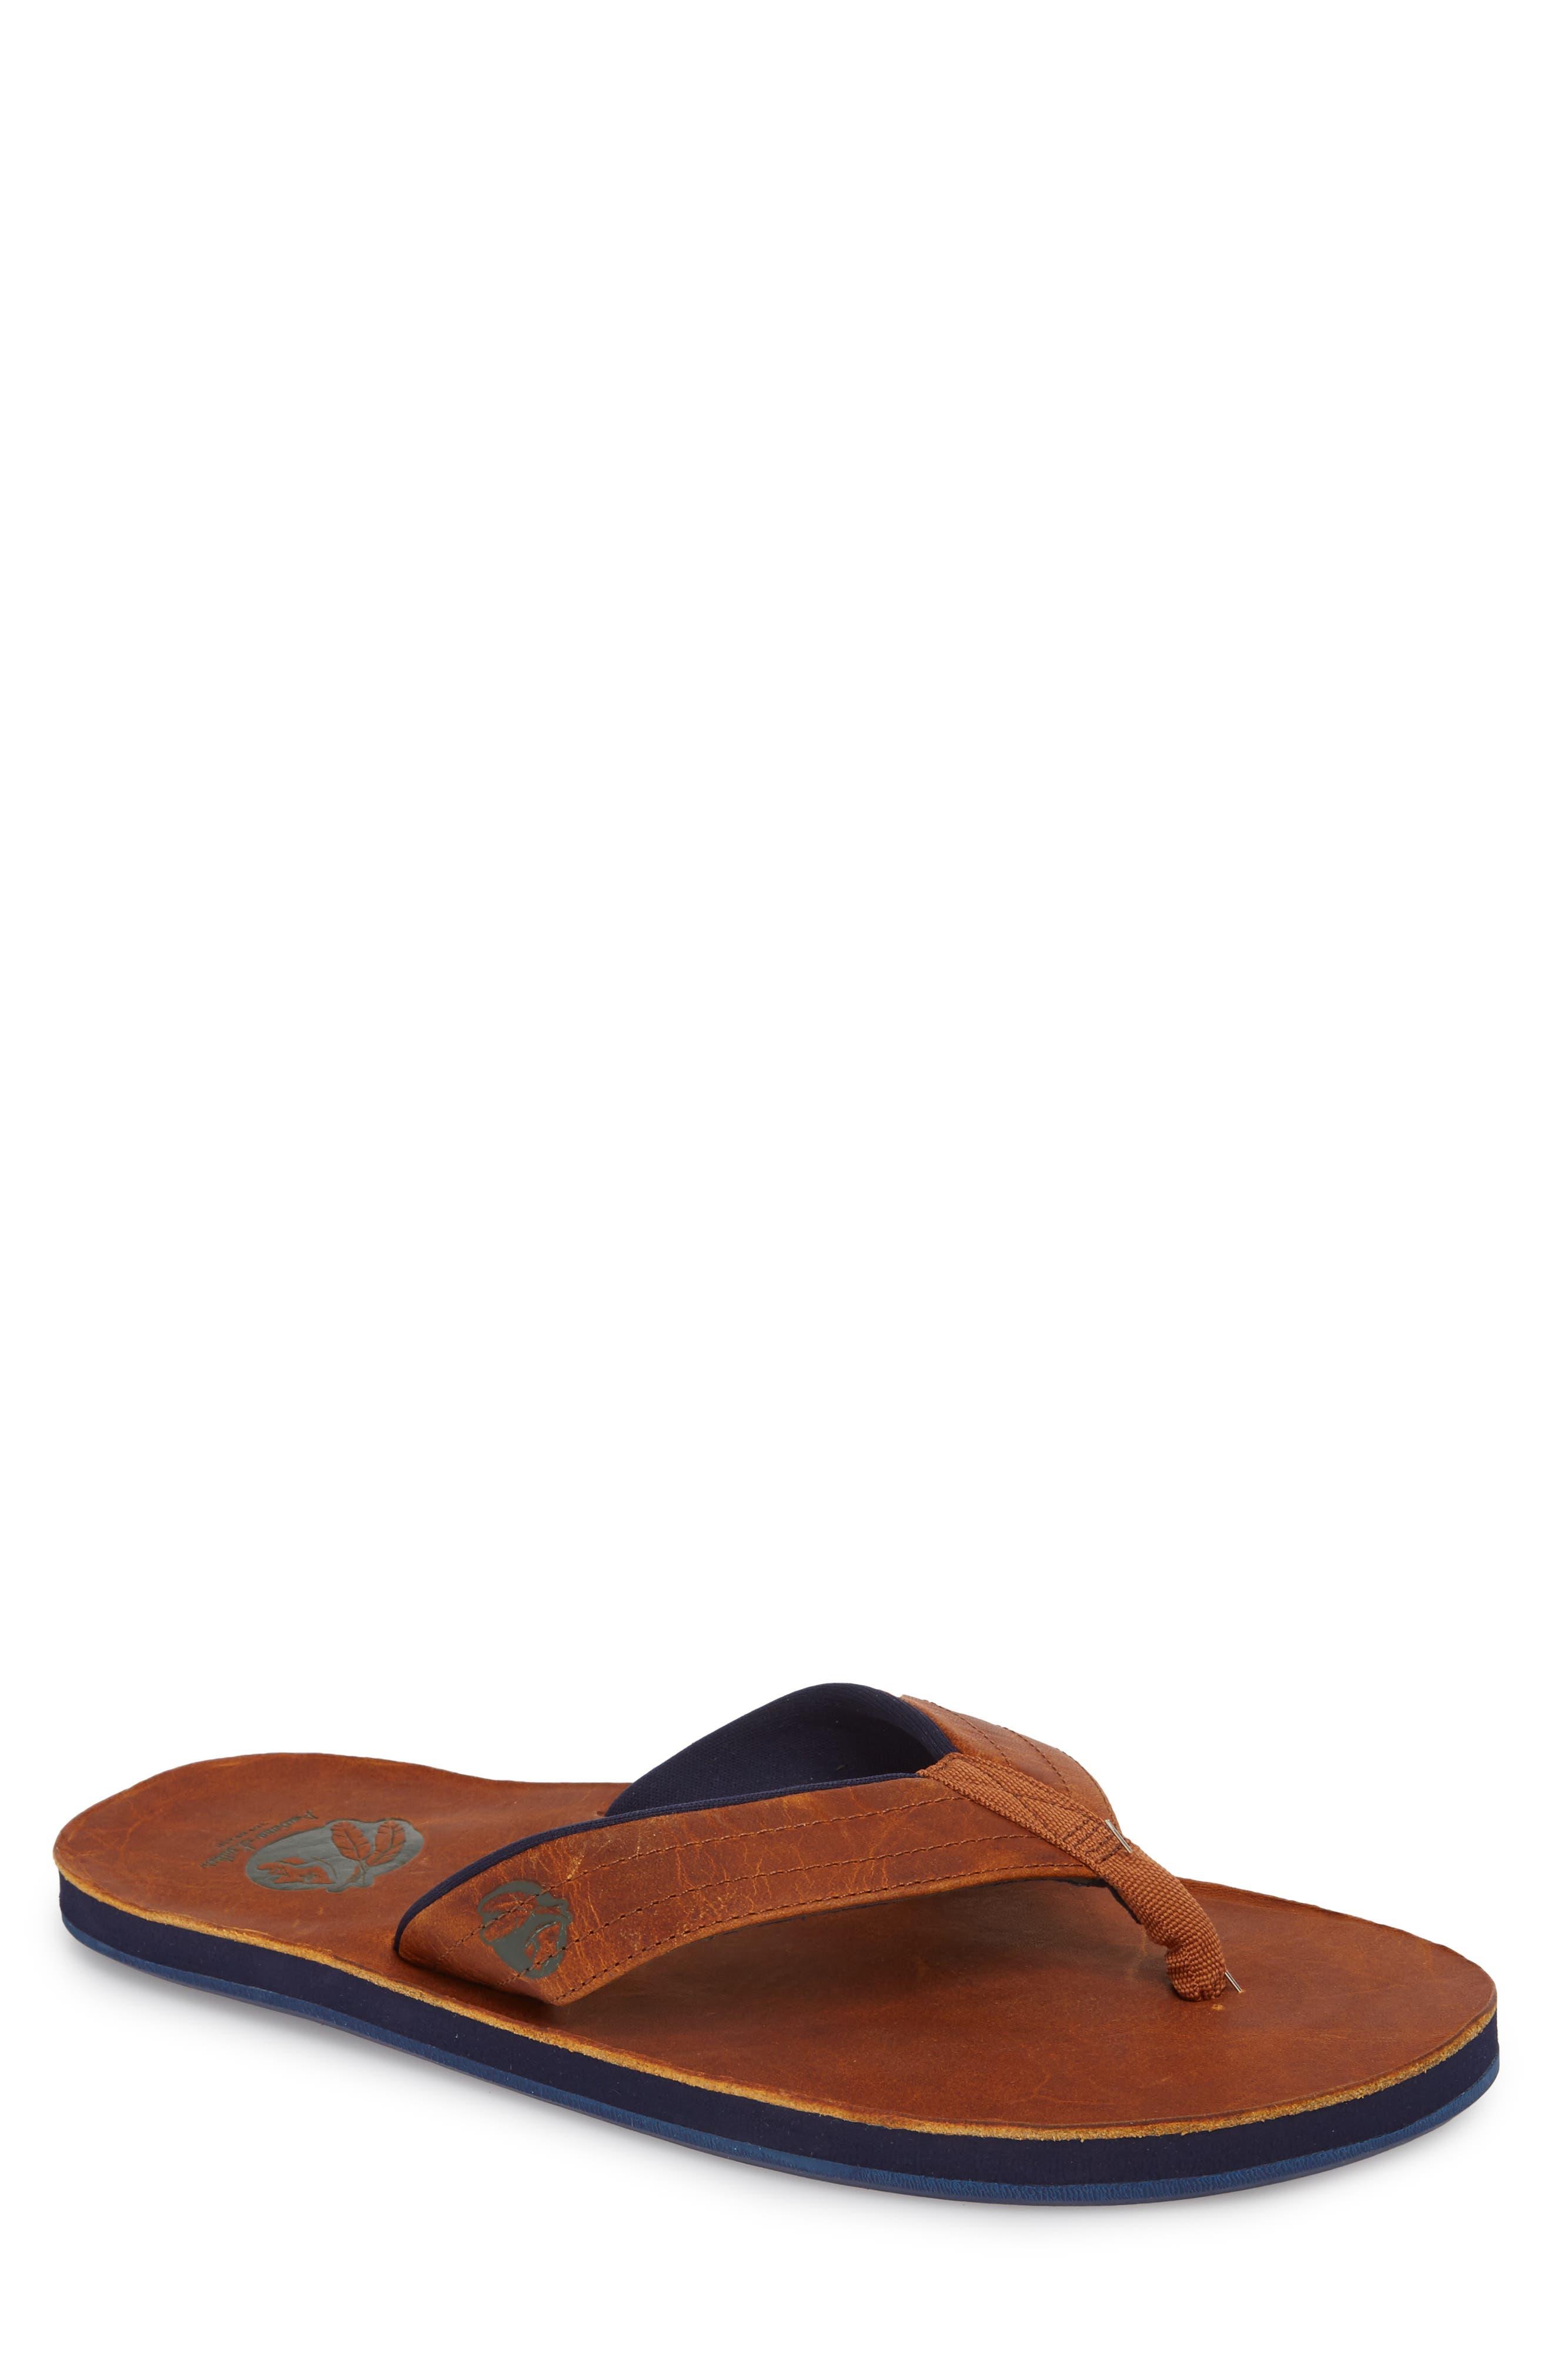 Nokona Flip Flop,                         Main,                         color, Generation Brown Leather